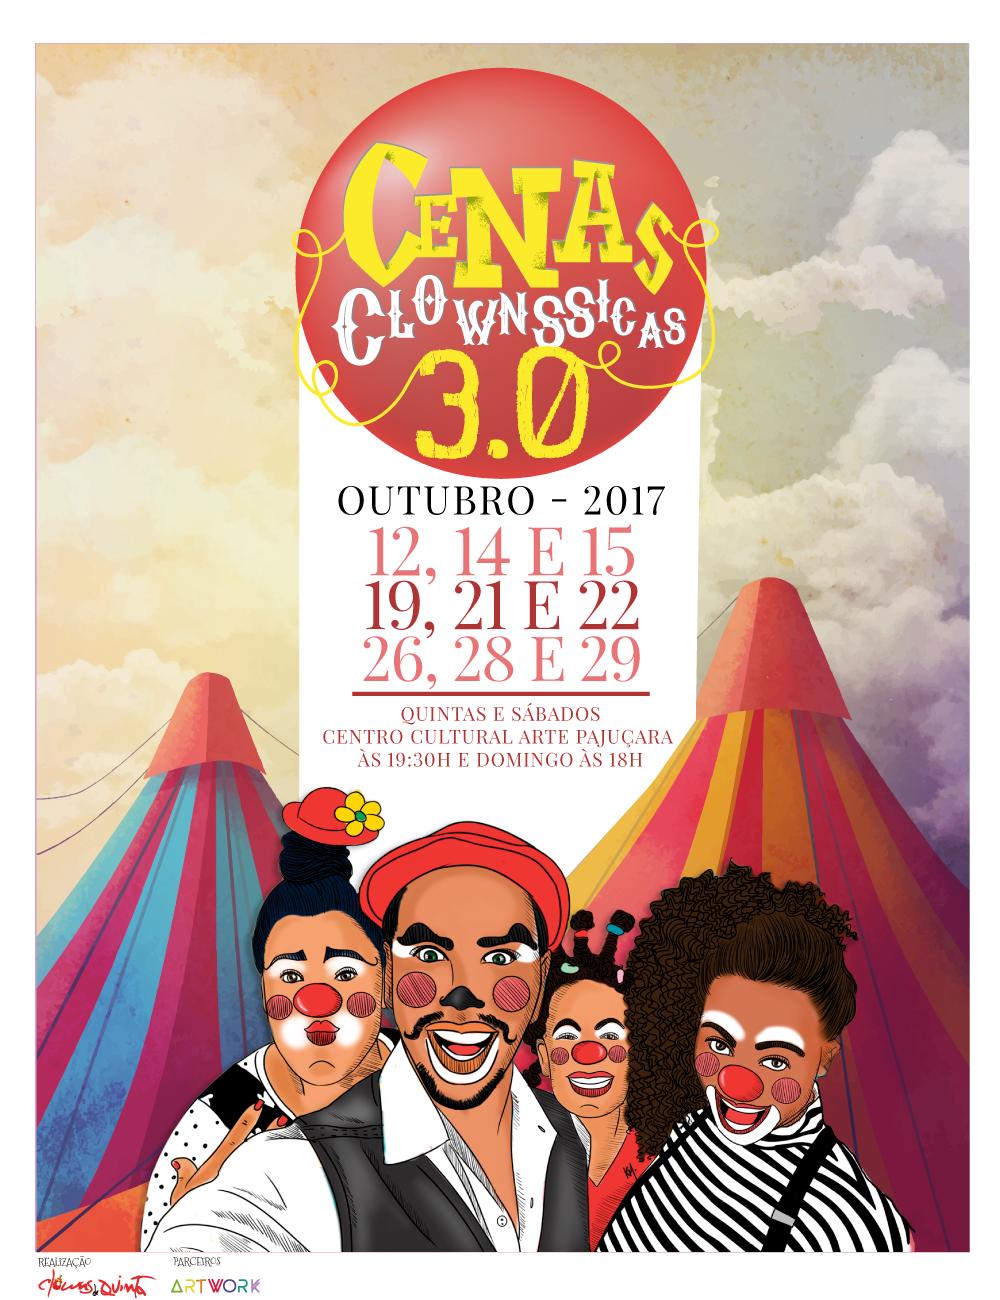 Cenas Clownssícas 3.0